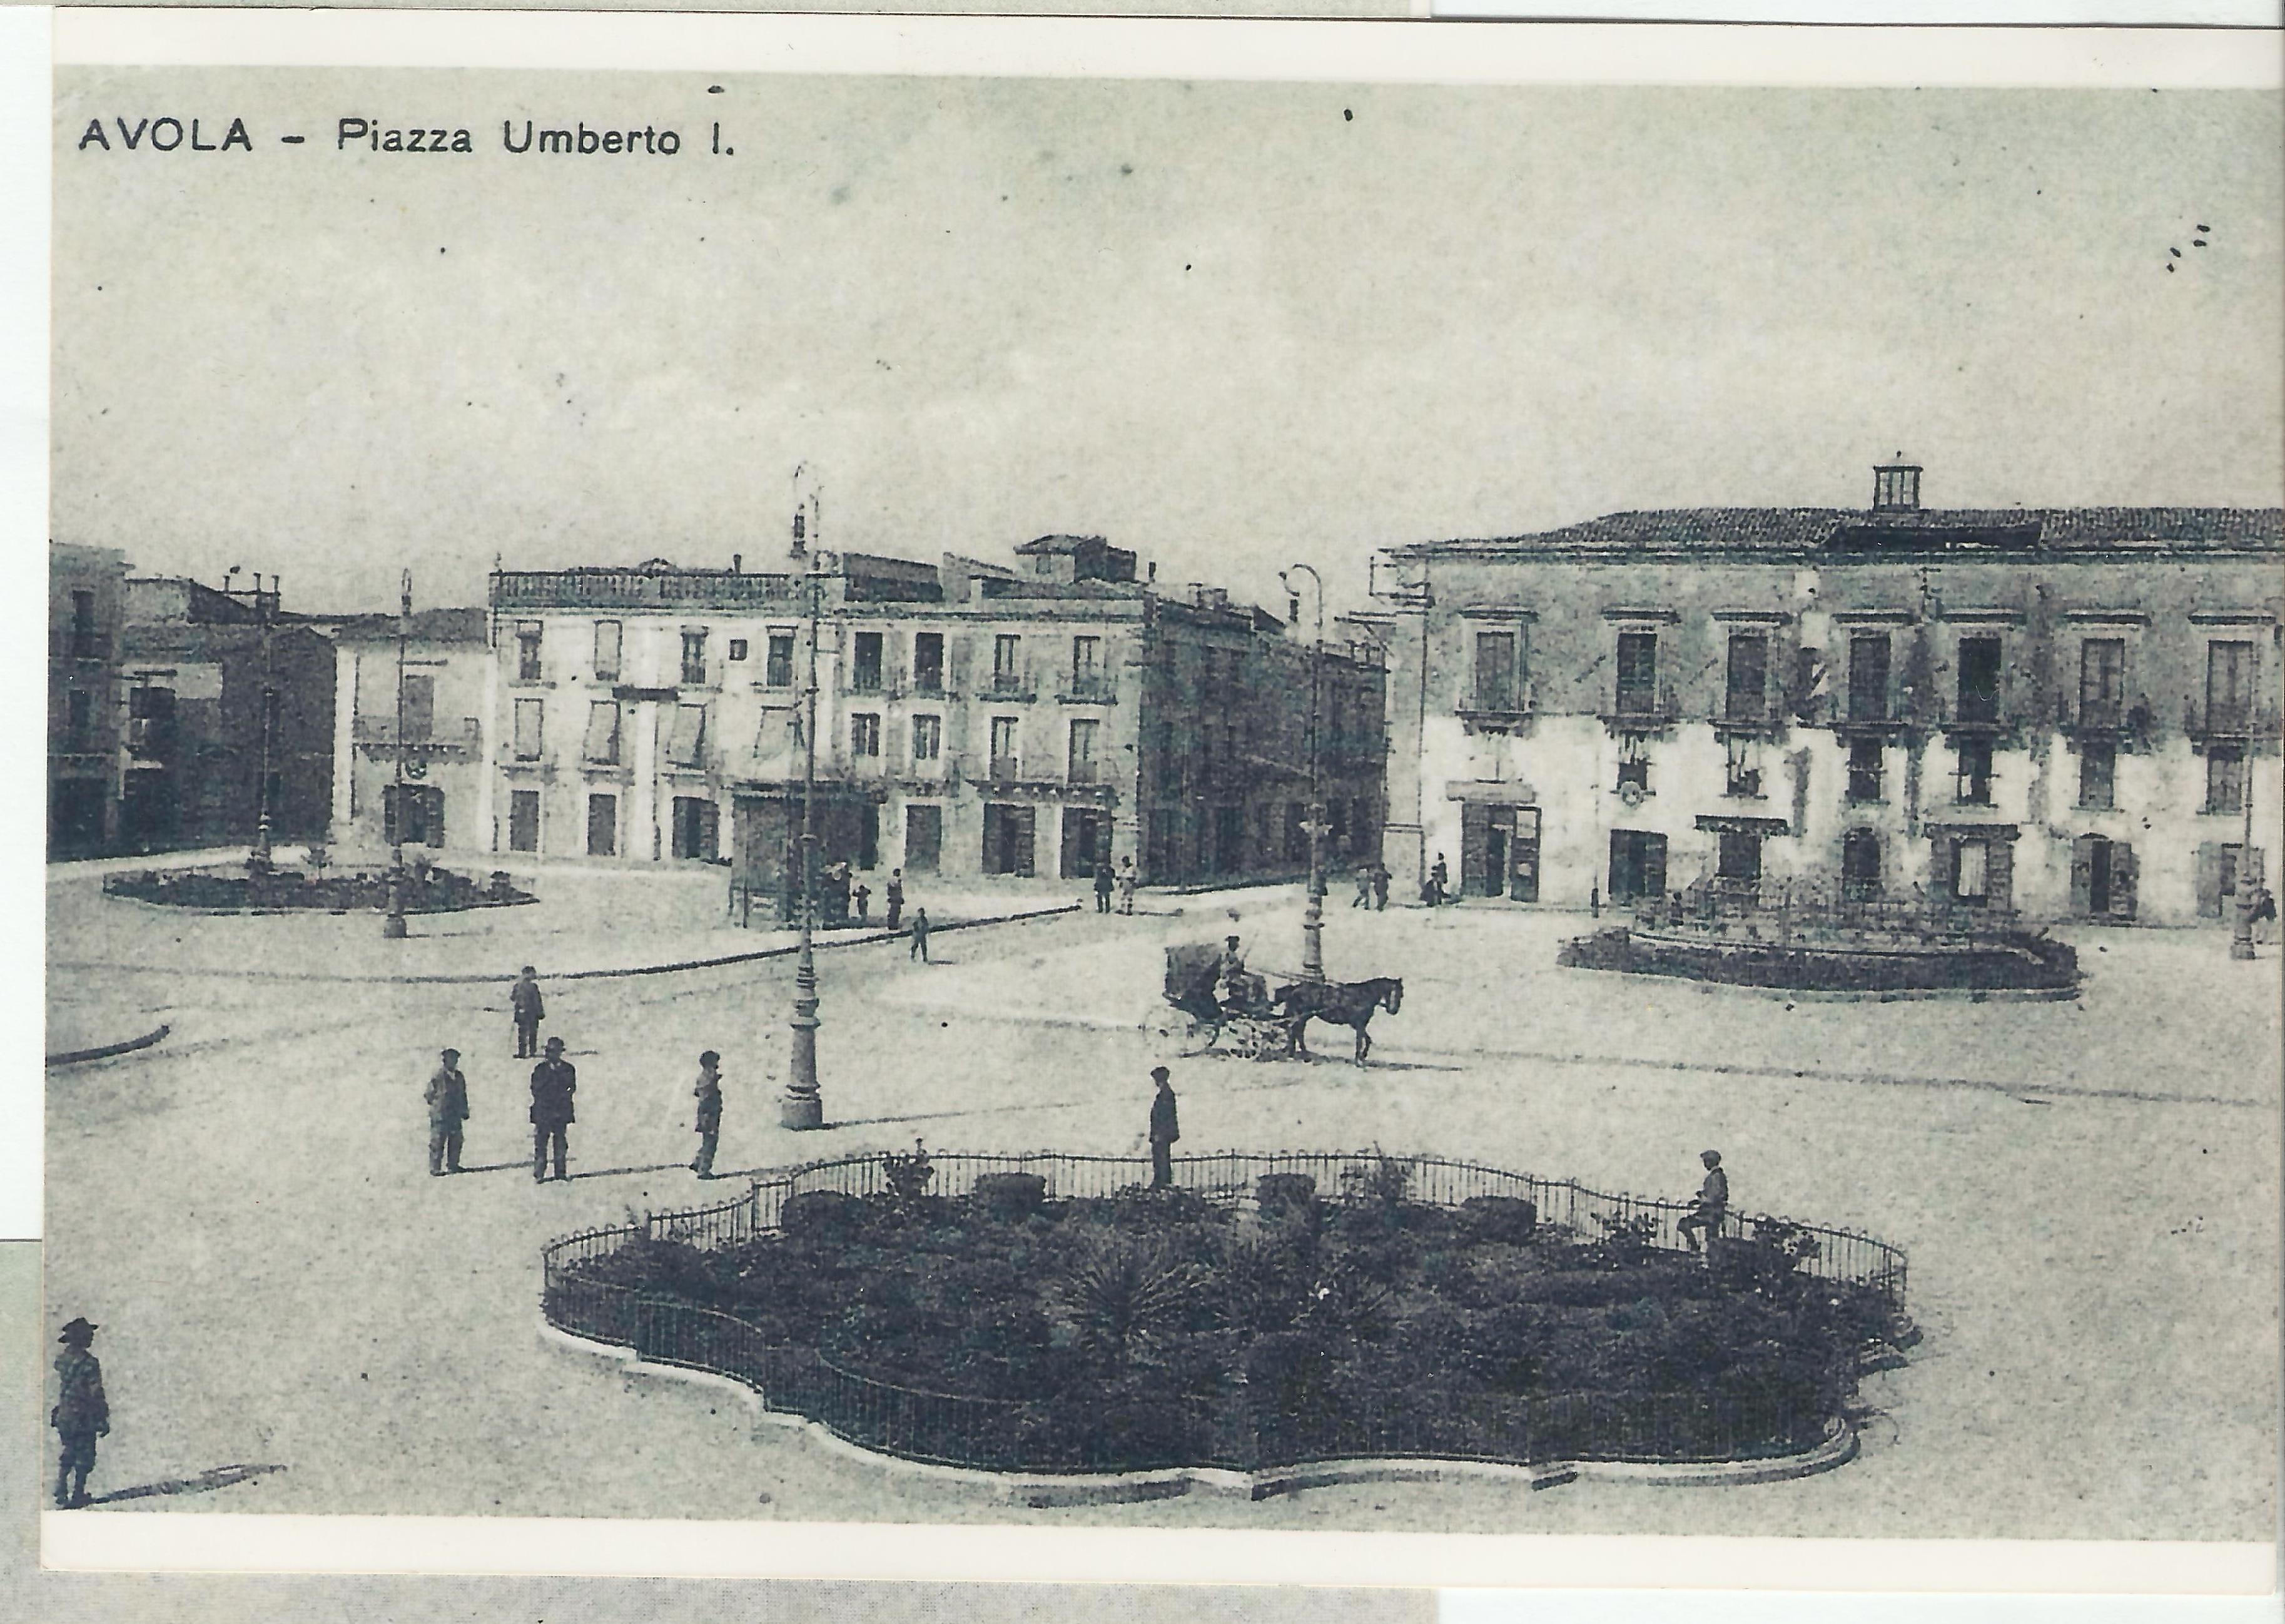 foto-consiglio-album-del-territorio-avola-piazza-umberto-I